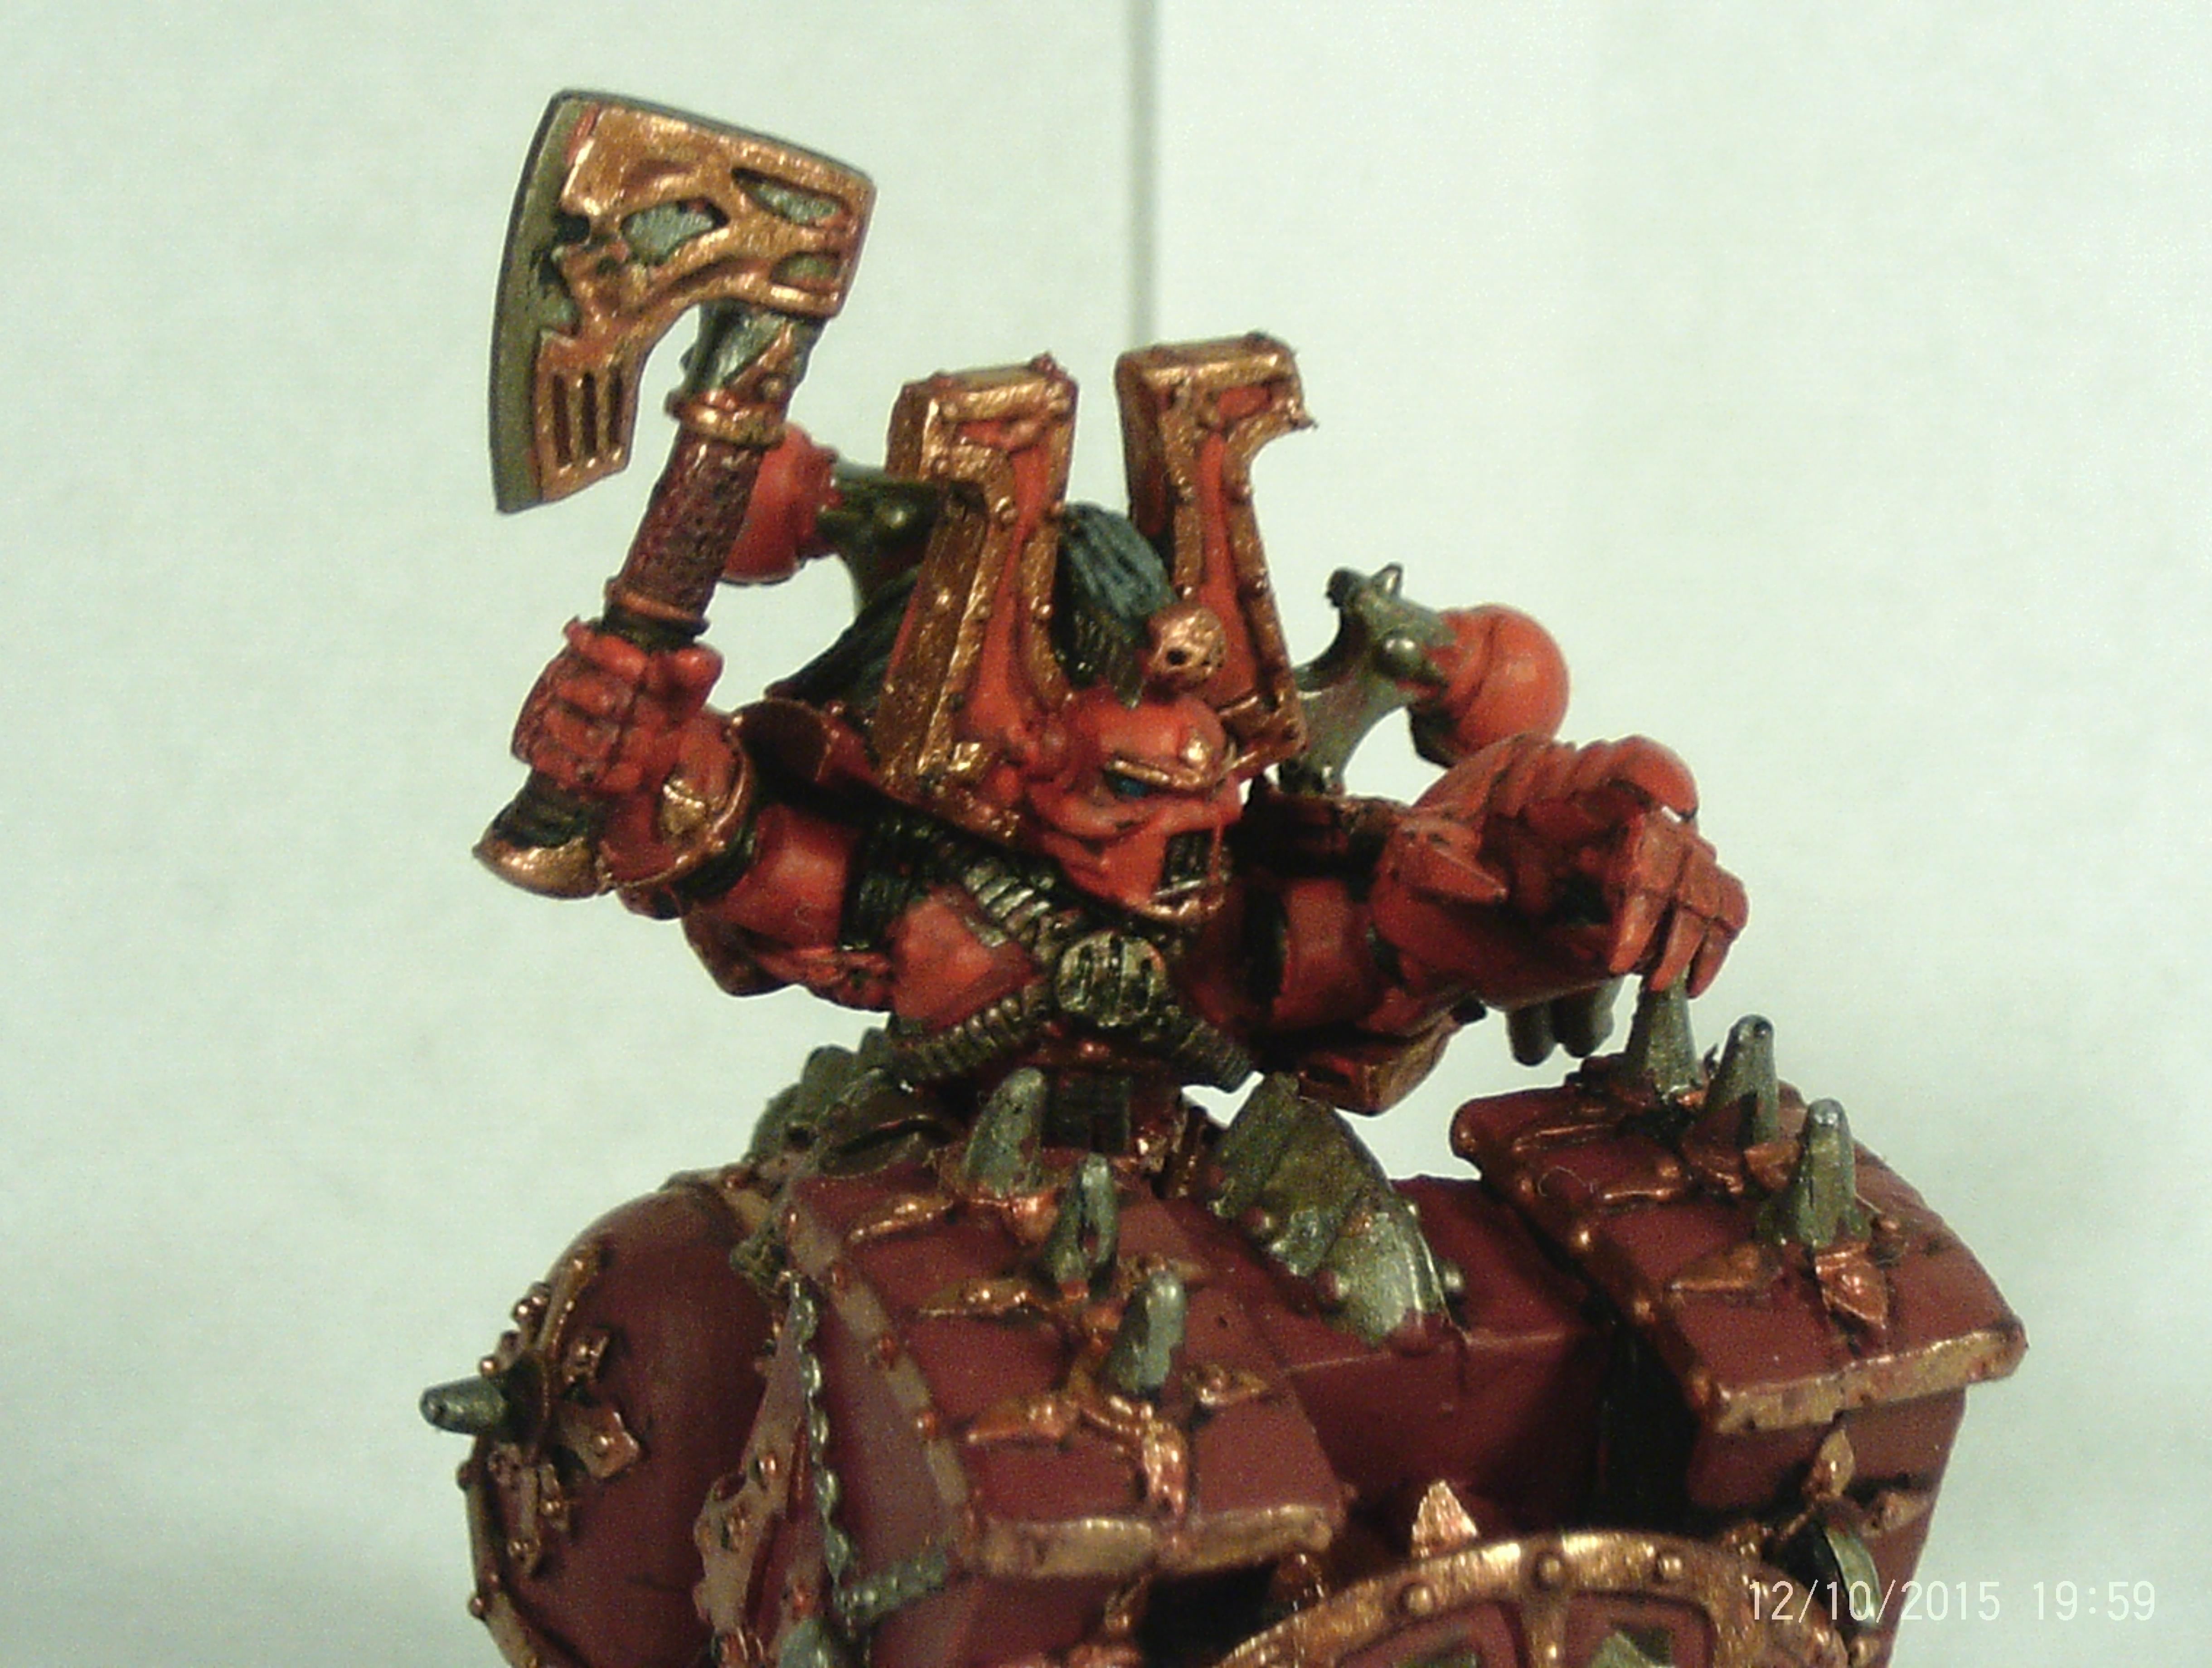 Beast, Cavalry, Chaos, Daemonkin, Daemons, Juggernaut, Khorne, Lord